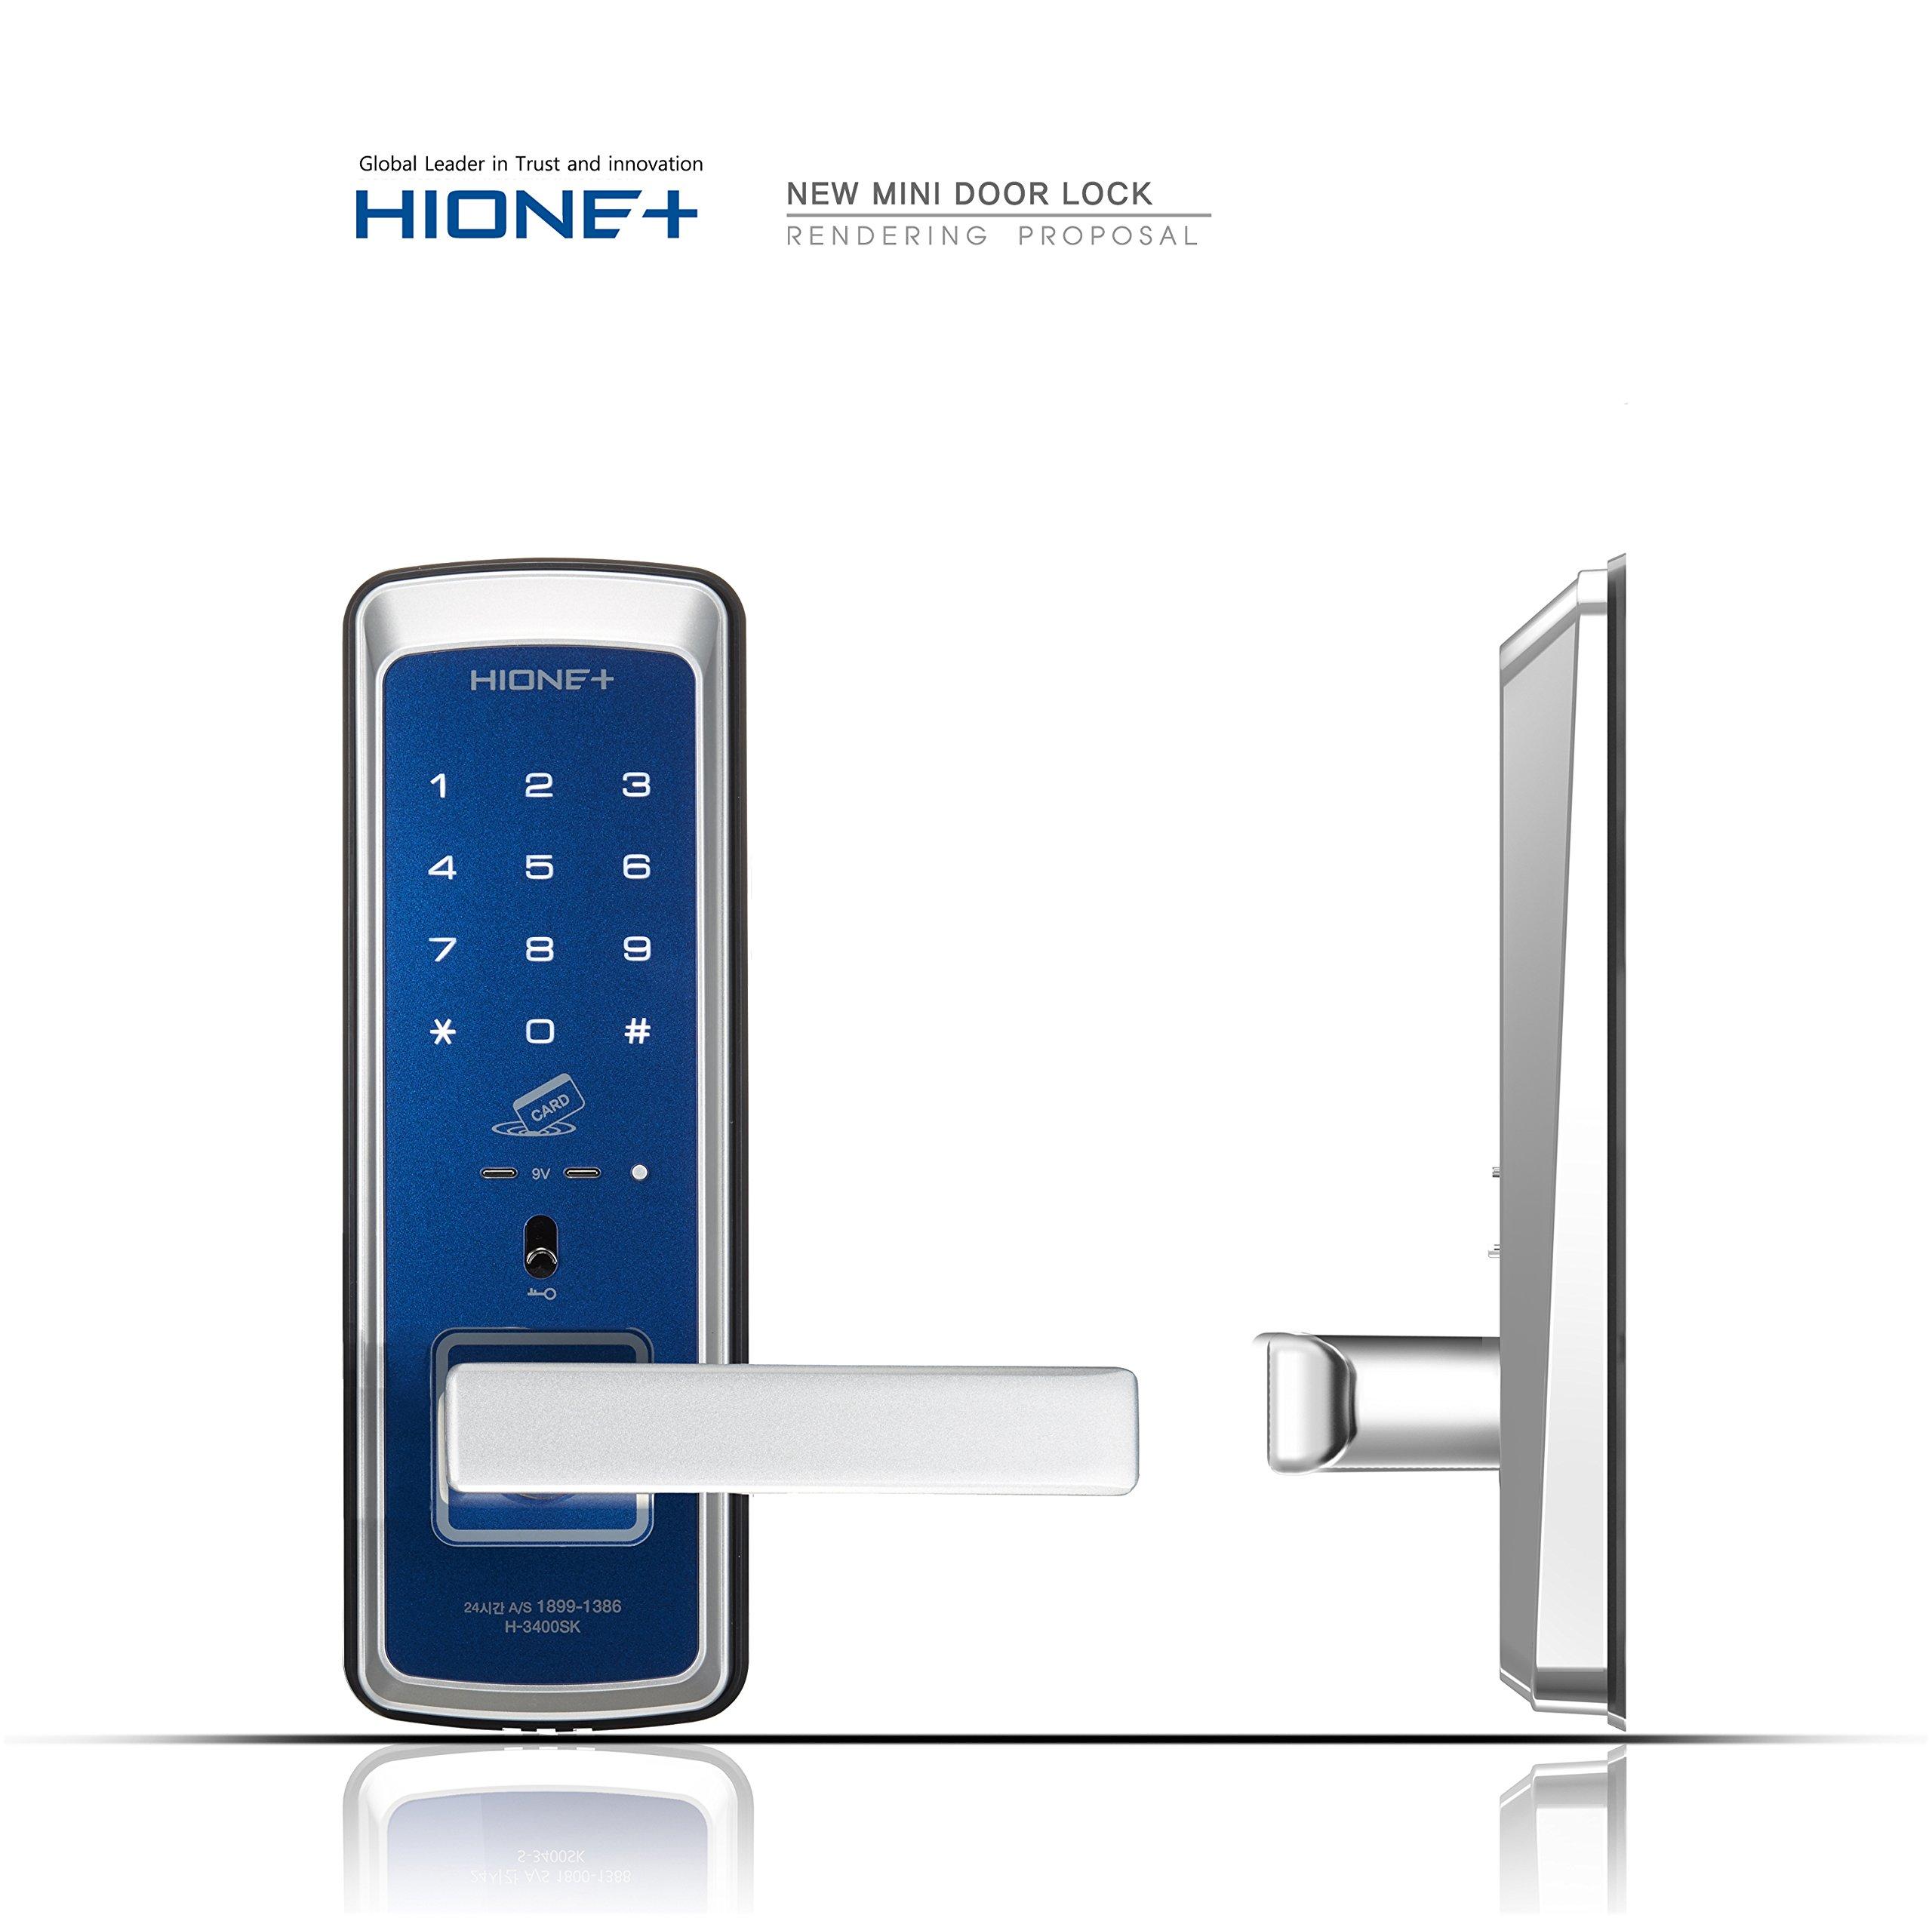 HionePlus H-3400SK, Digital Mini Main Door Lock, PIN+Card+Emergency Key